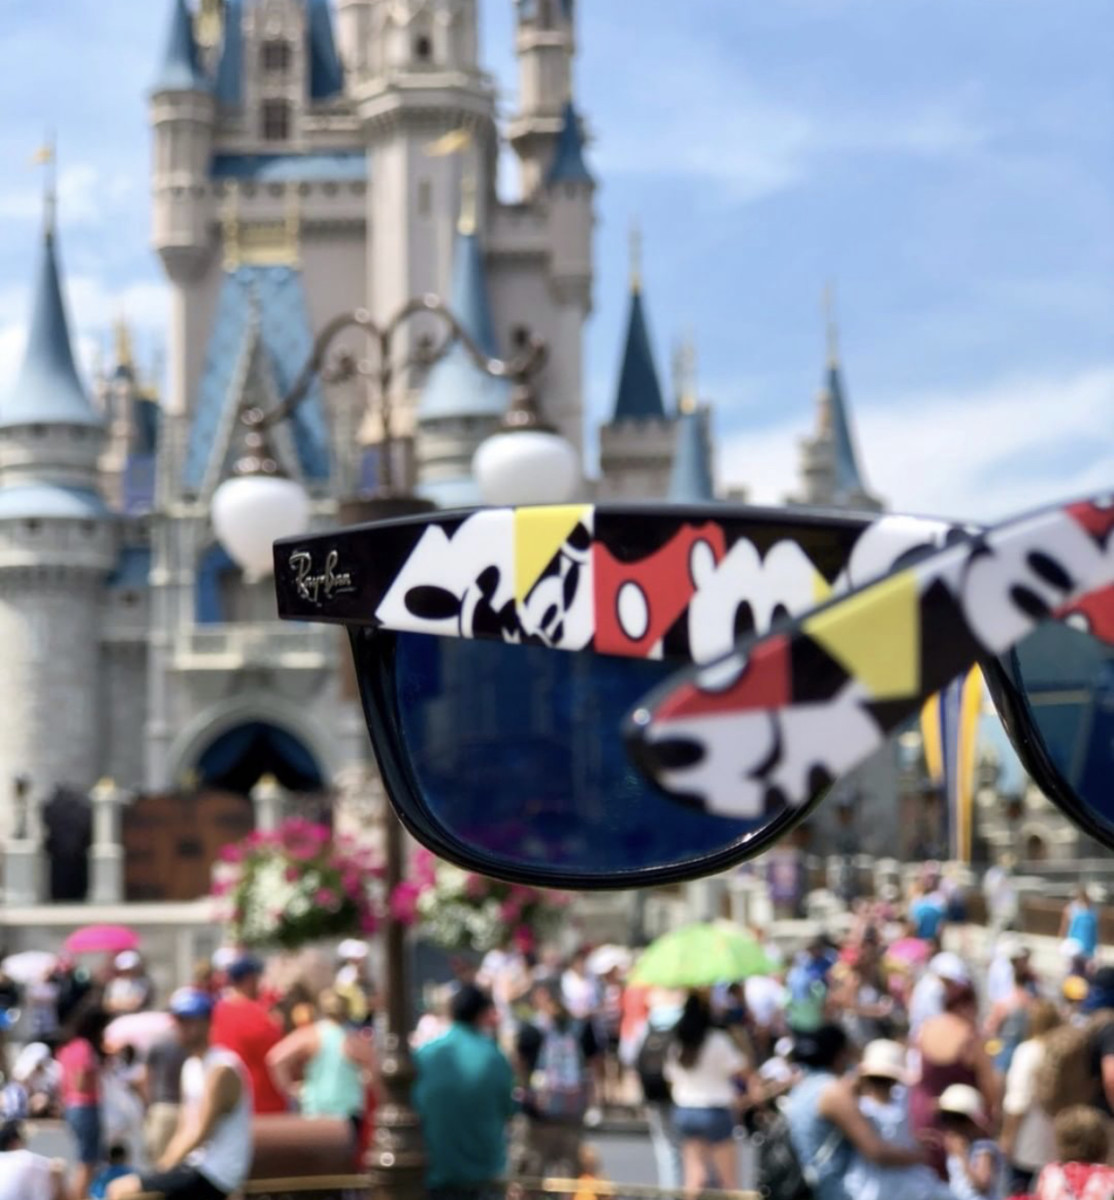 New Mickey Ray-Ban Shades For Hot Summer Days 4